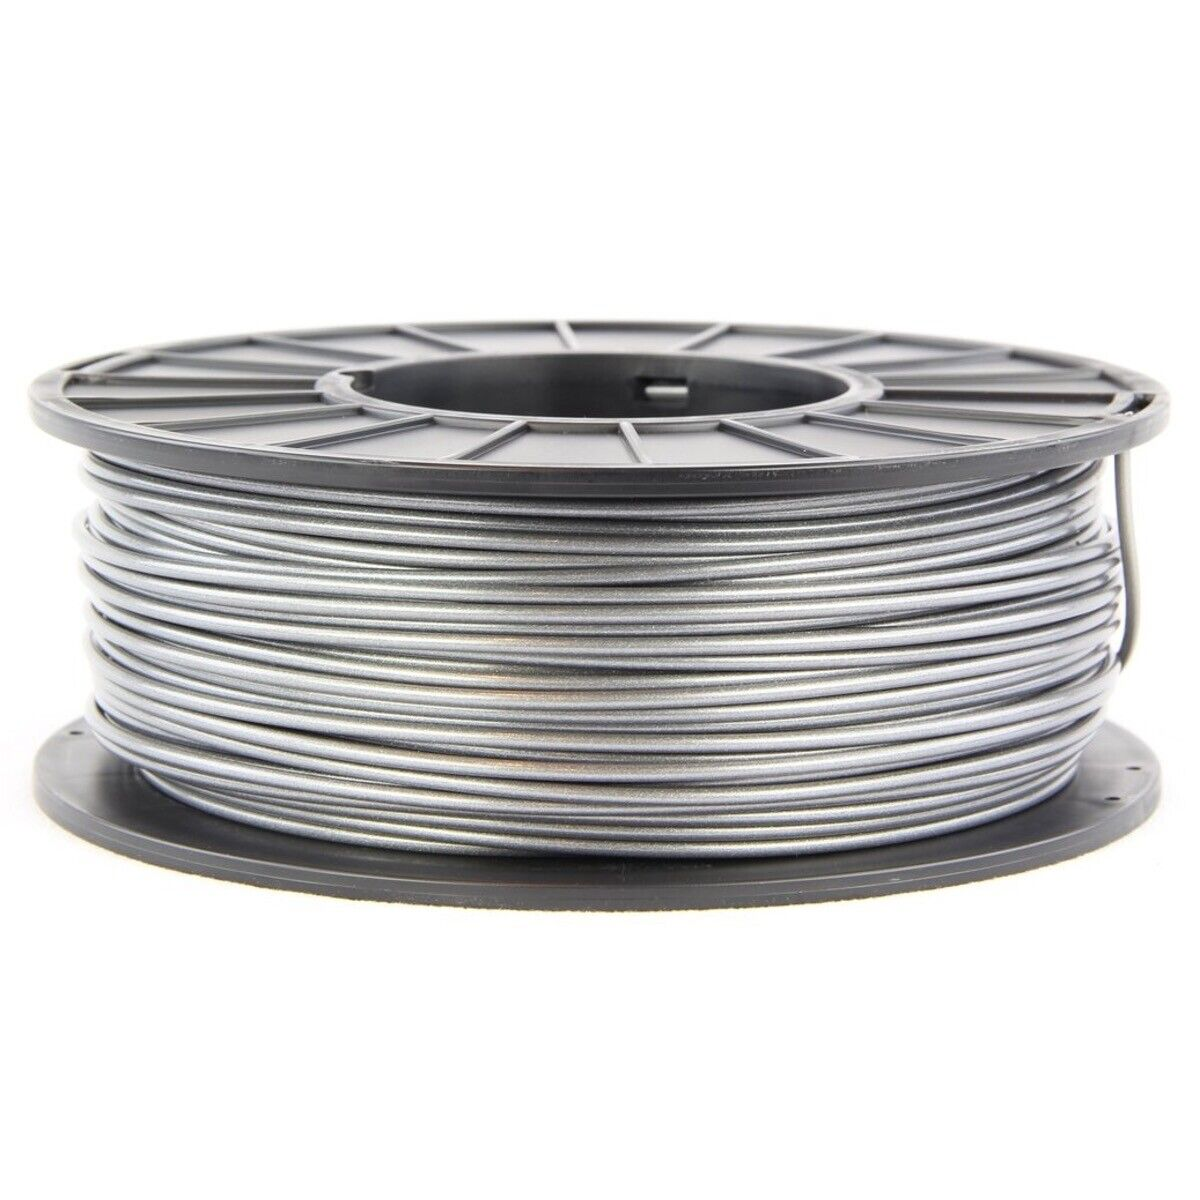 [3DMakerWorld] Premium PLA Filament - 2.85mm, 1kg, Silver